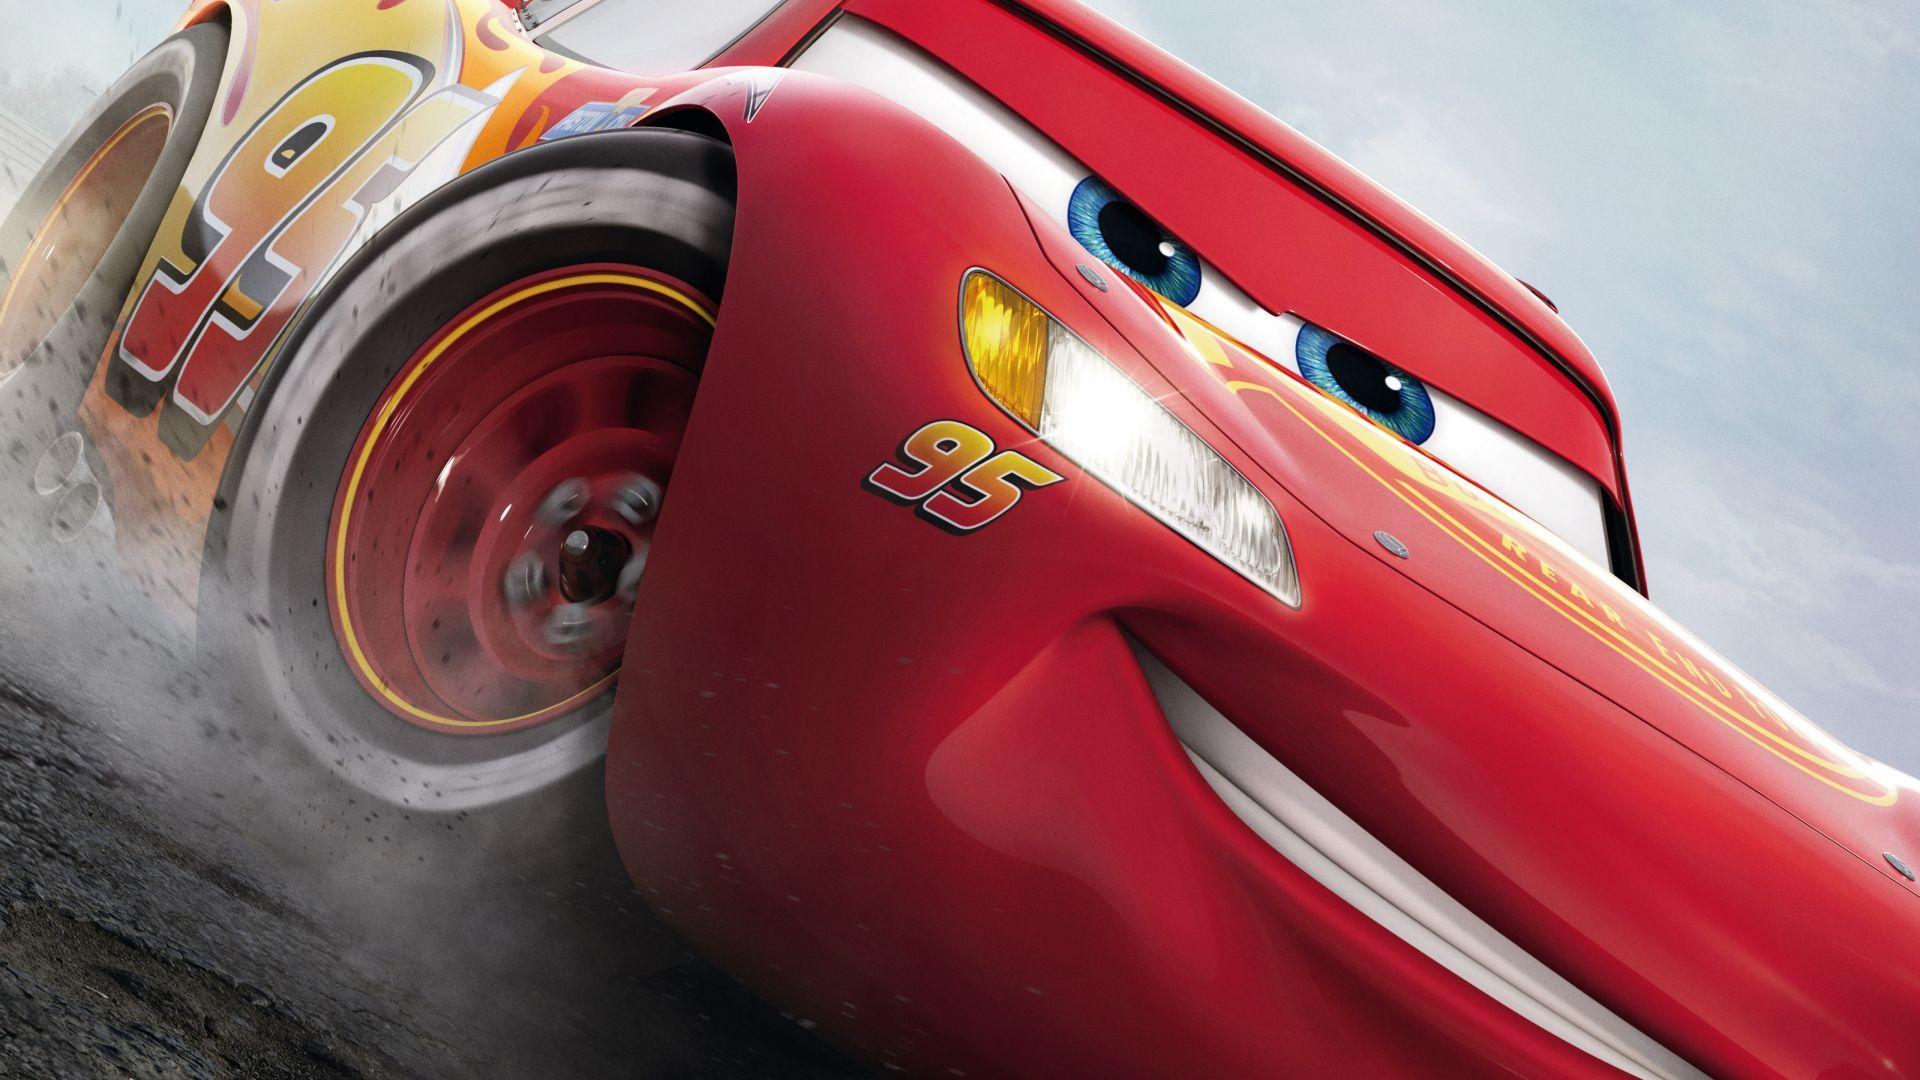 Disney Cars Painting Online